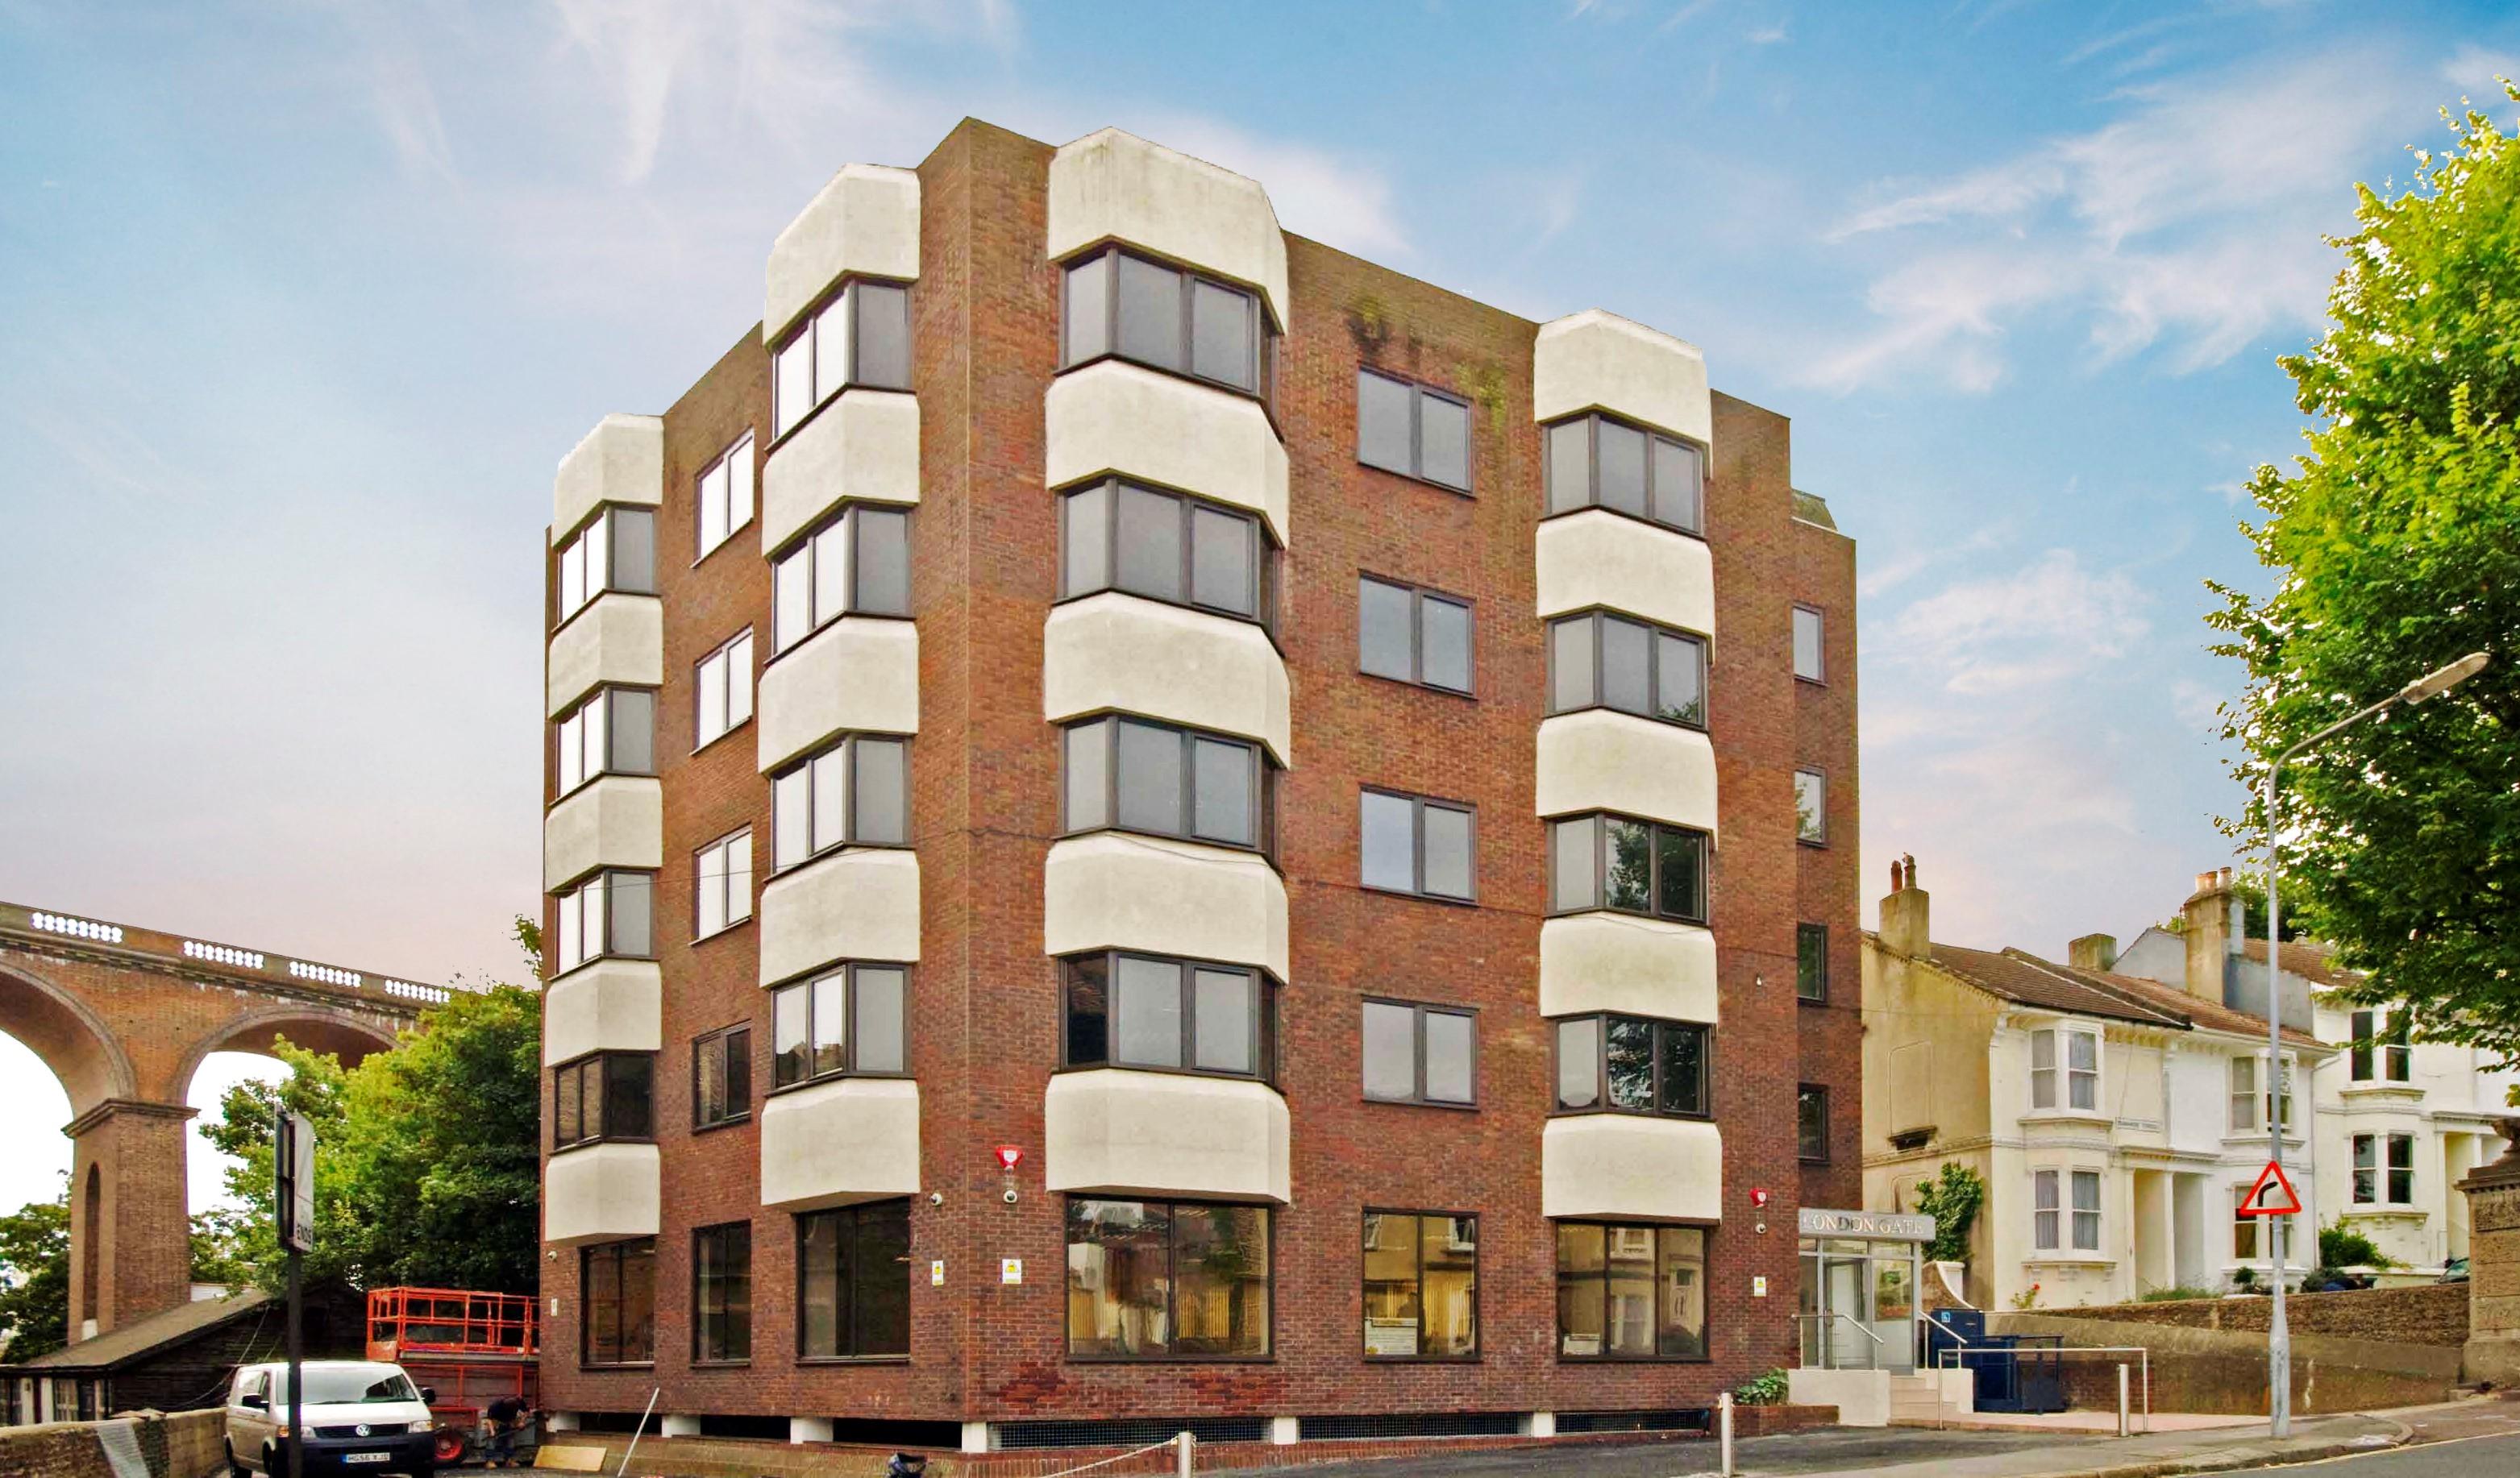 Letting Complete - London Gate, 72 Dyke Road Drive, Brighton